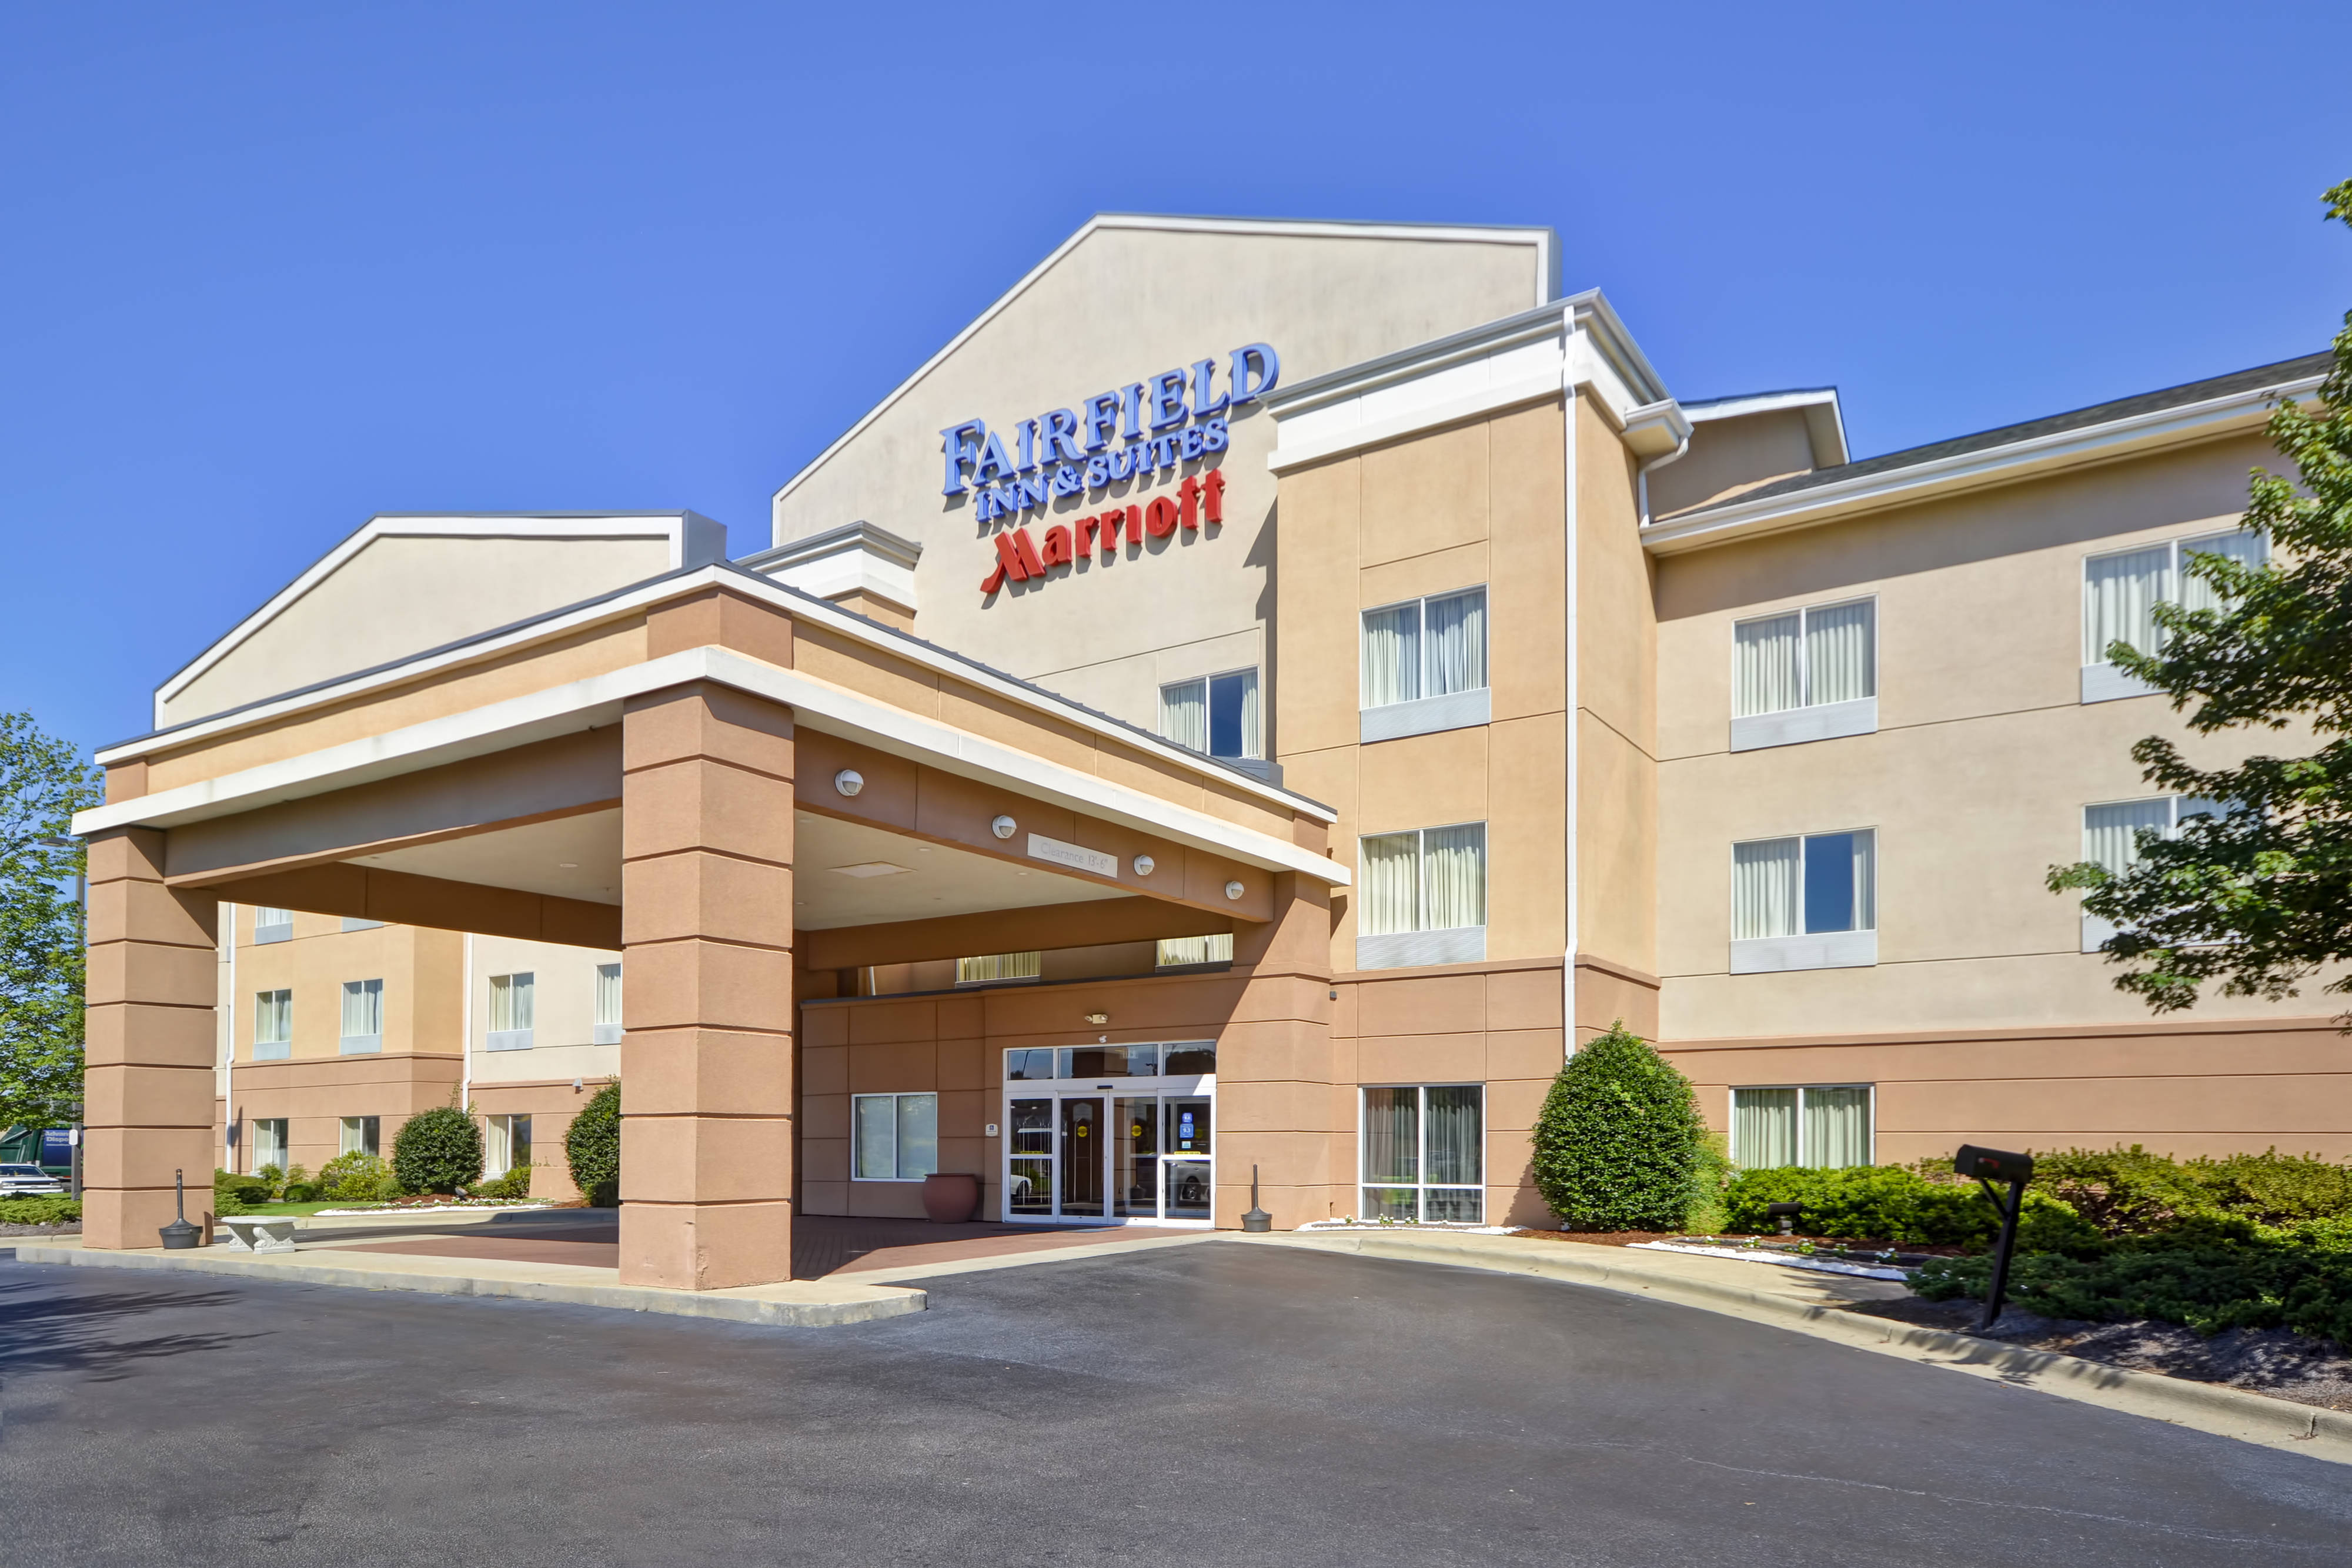 Fairfield Inn & Suites By Marriott Birmingham Fultondale / I-65